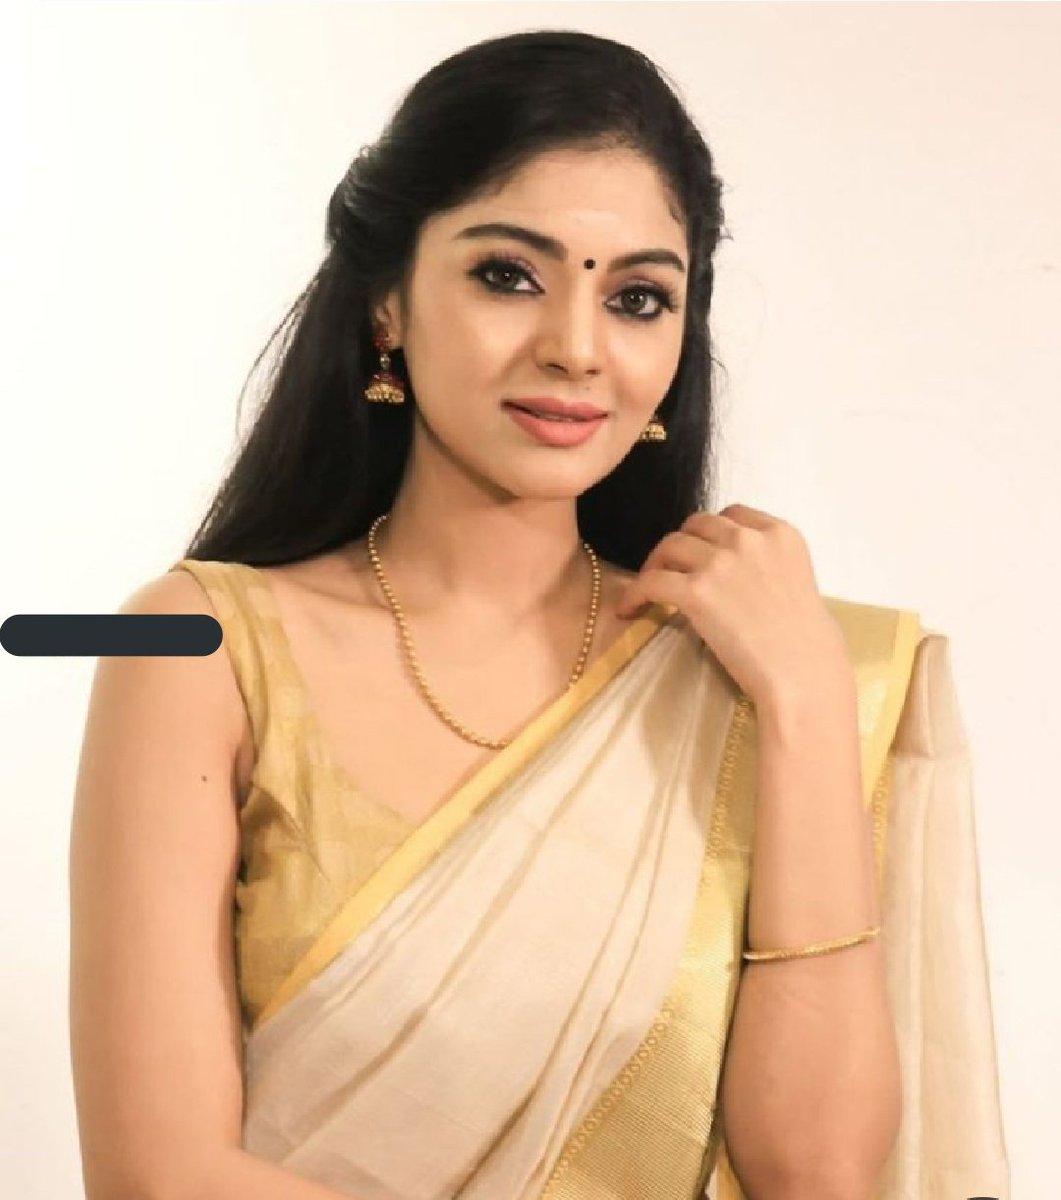 Shoutout model & actress our Instagram page shoutoutmodeltheelite . actress @SanamShetty_ she is #gorgeous in #saree #SareeTwitter #SanamShetty #traditional #india #celebrity #Bangalore #kerala #models #BigBoss  #modeling  #modelcitizen #modellife #ModelStatus #kollywood #actress https://t.co/fA2tDYMwFb